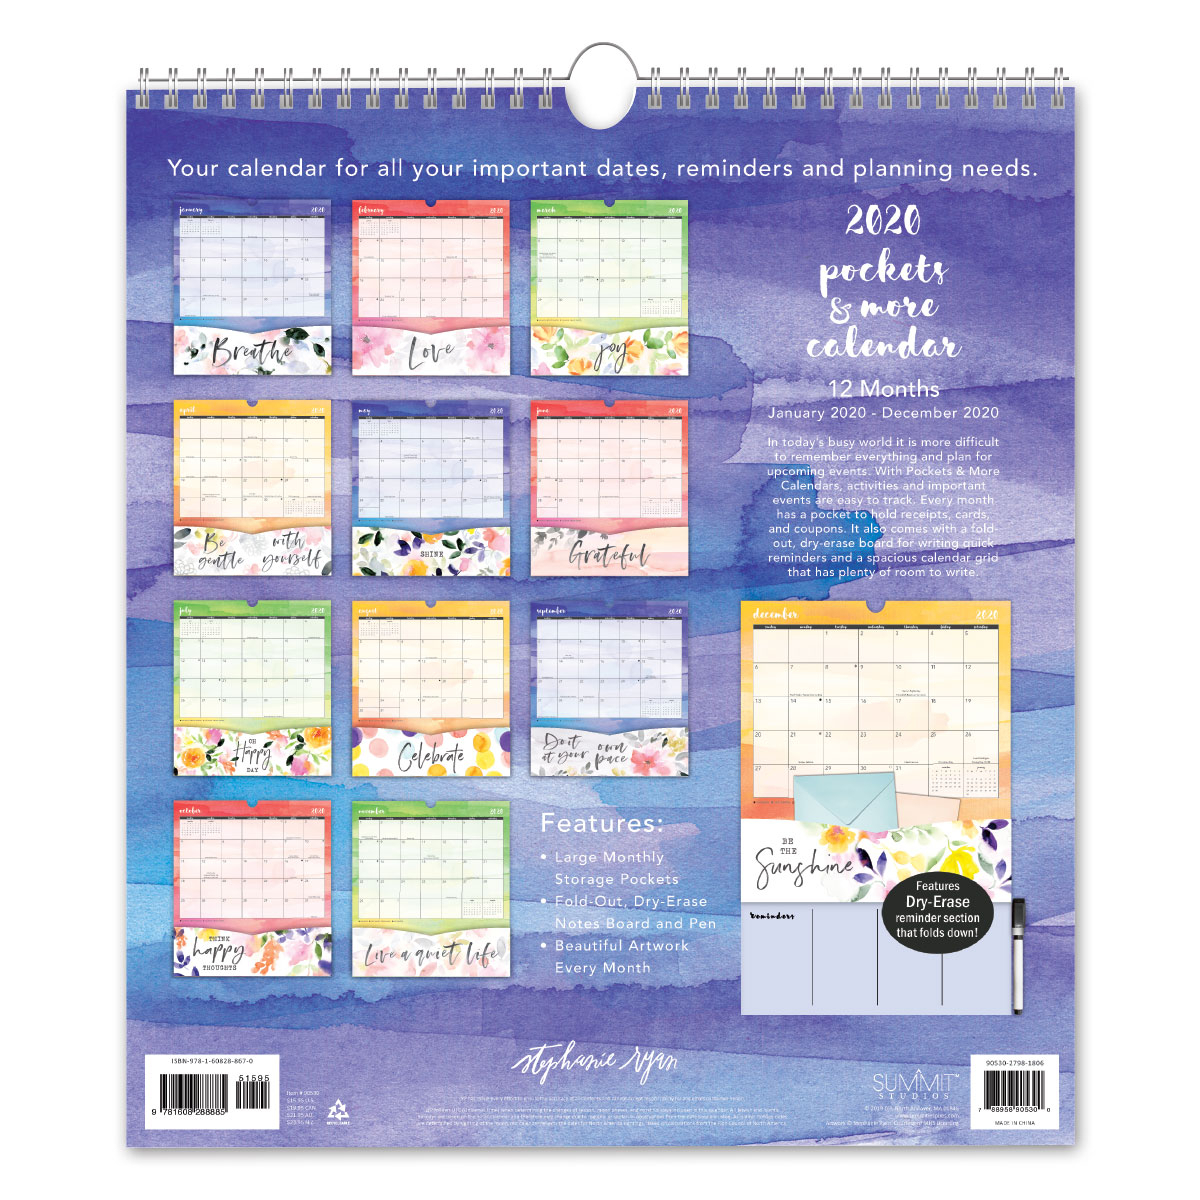 Petal & Lightstephanie Ryan 2020 Pockets & More Calendar